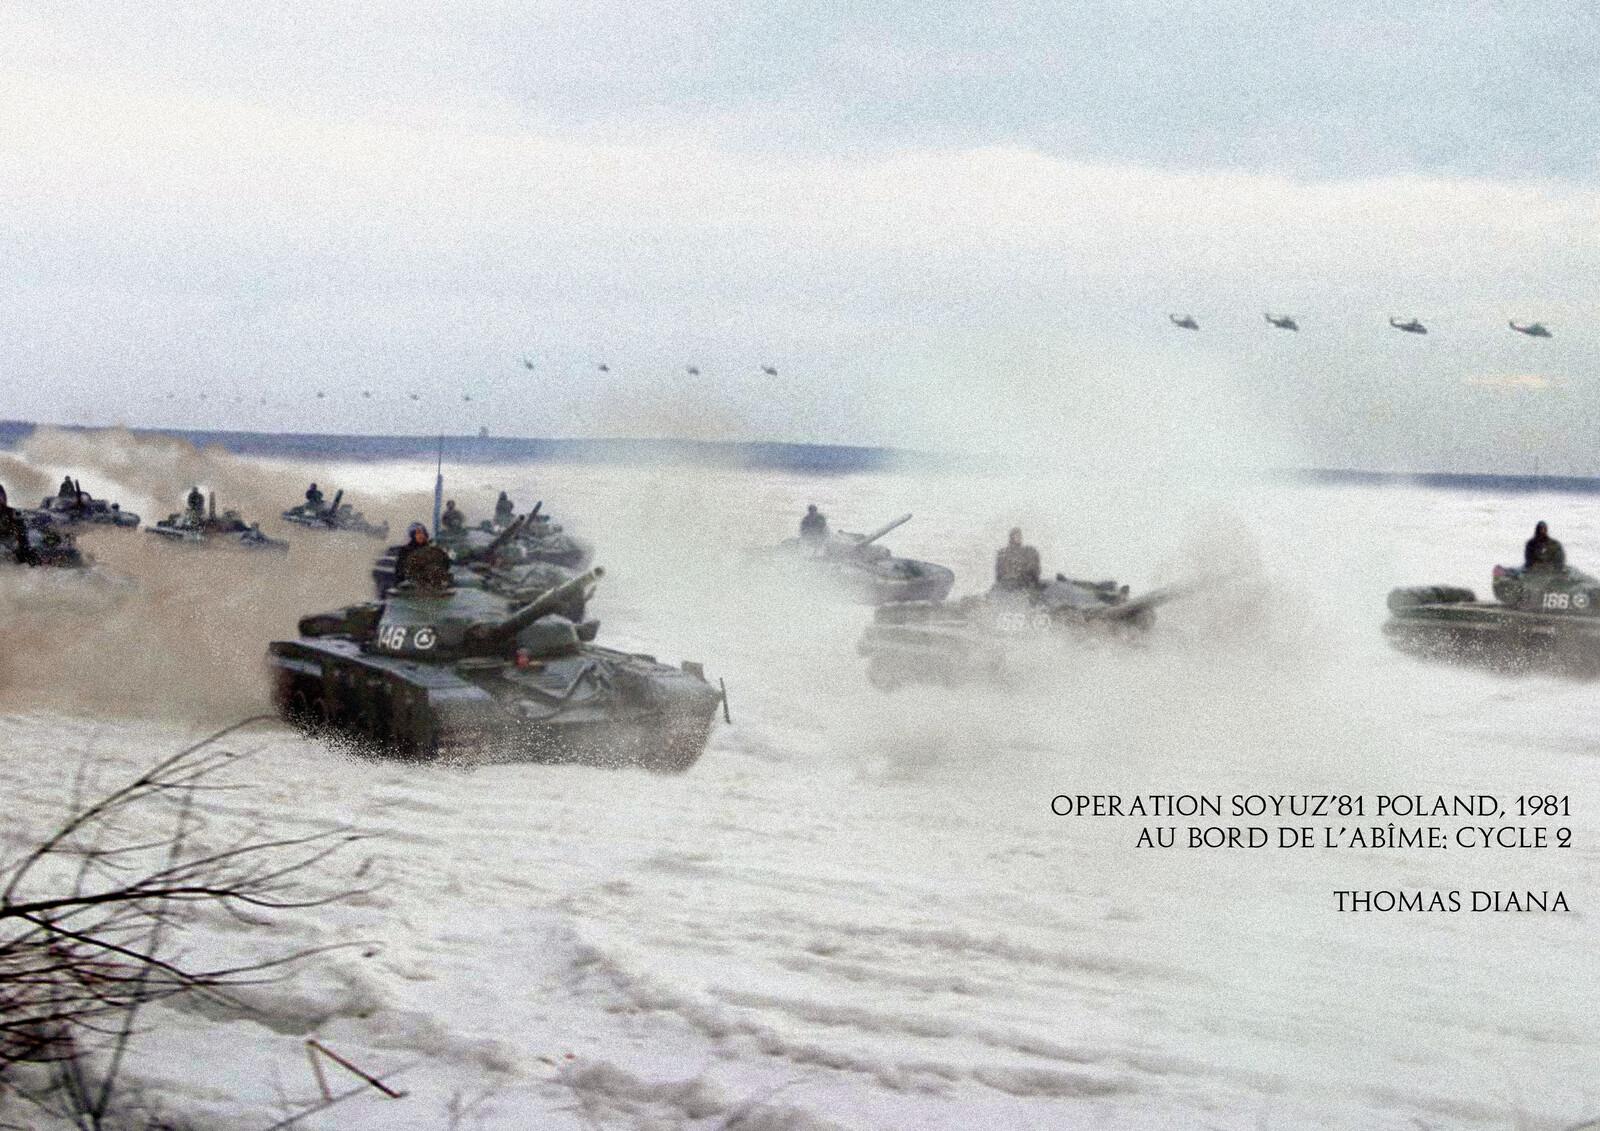 Soivet troops entering eastern Poland